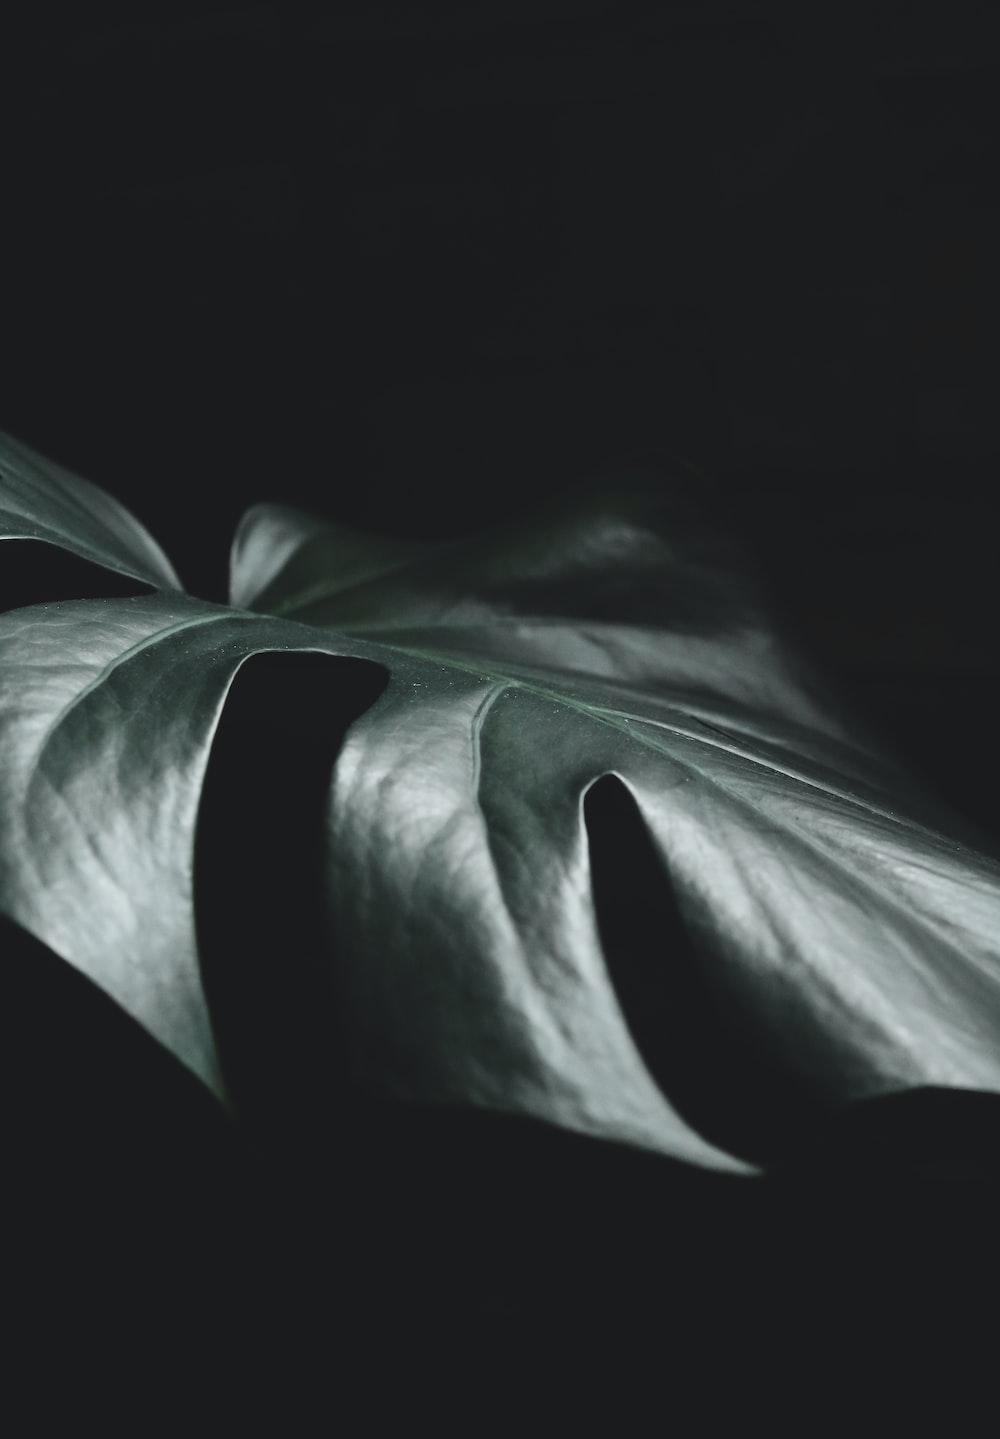 green leaf in dark room